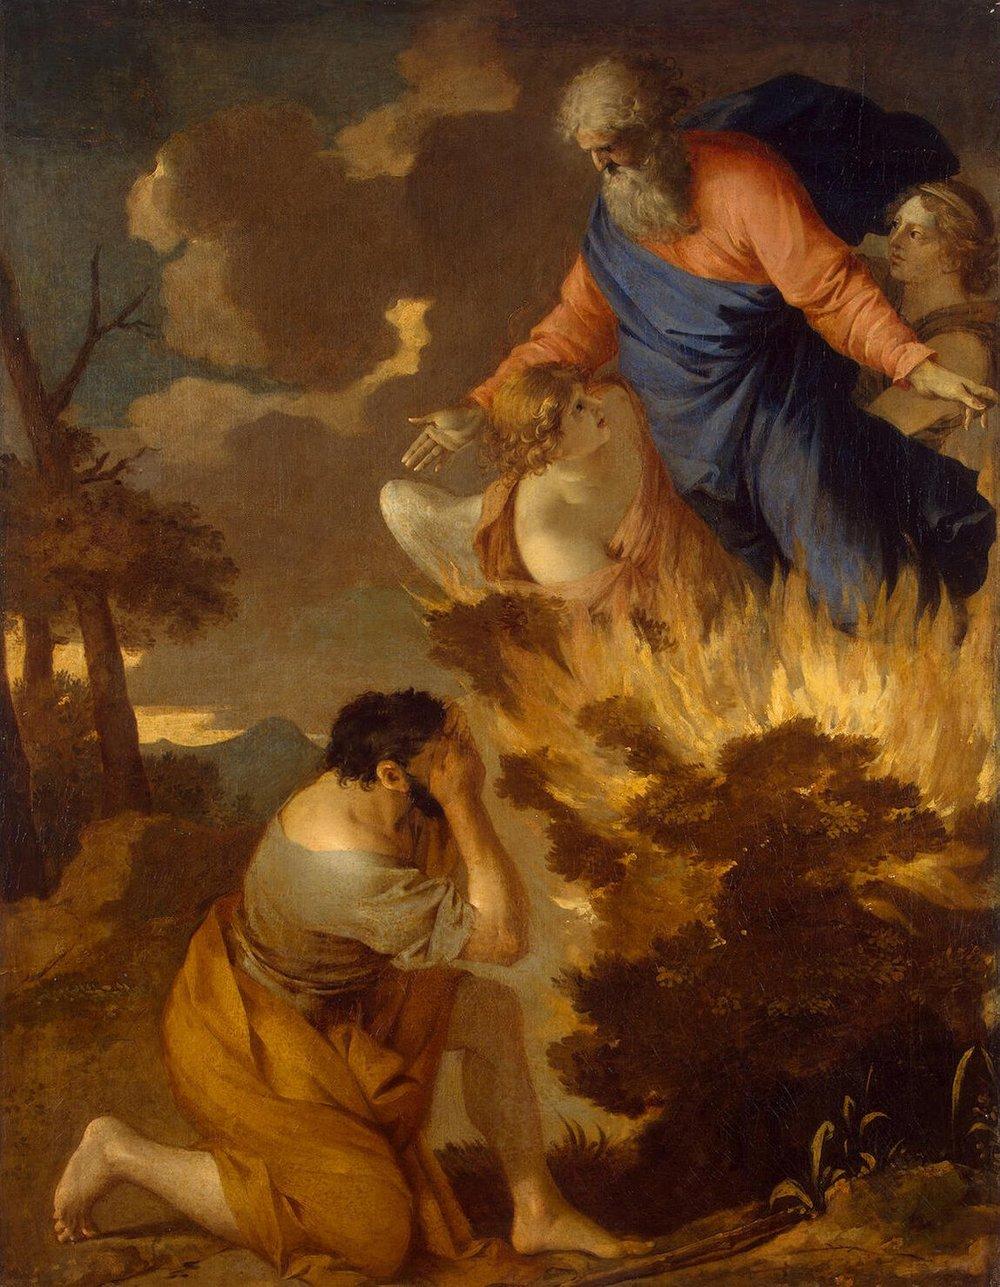 Moses and the Burning Bush, Sabastien Bourdon